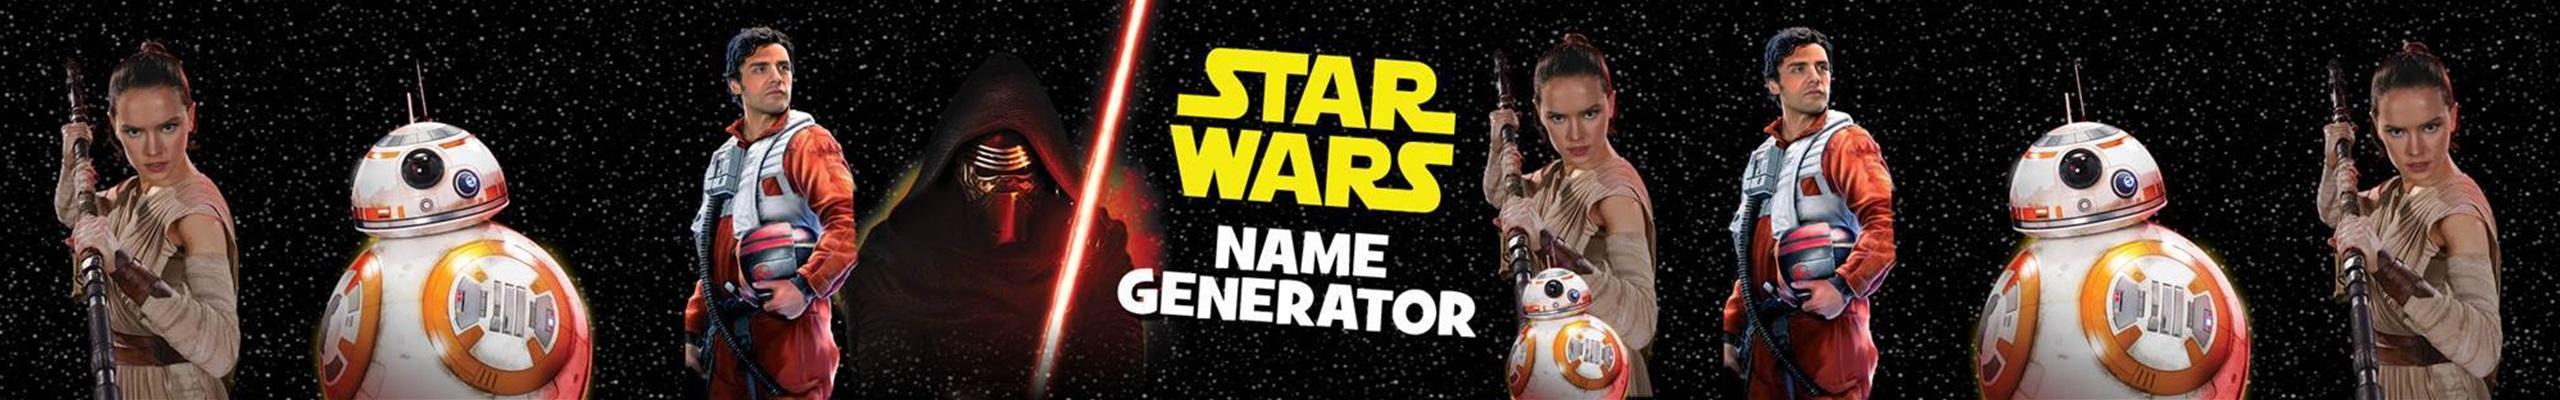 Star Wars Name Generator